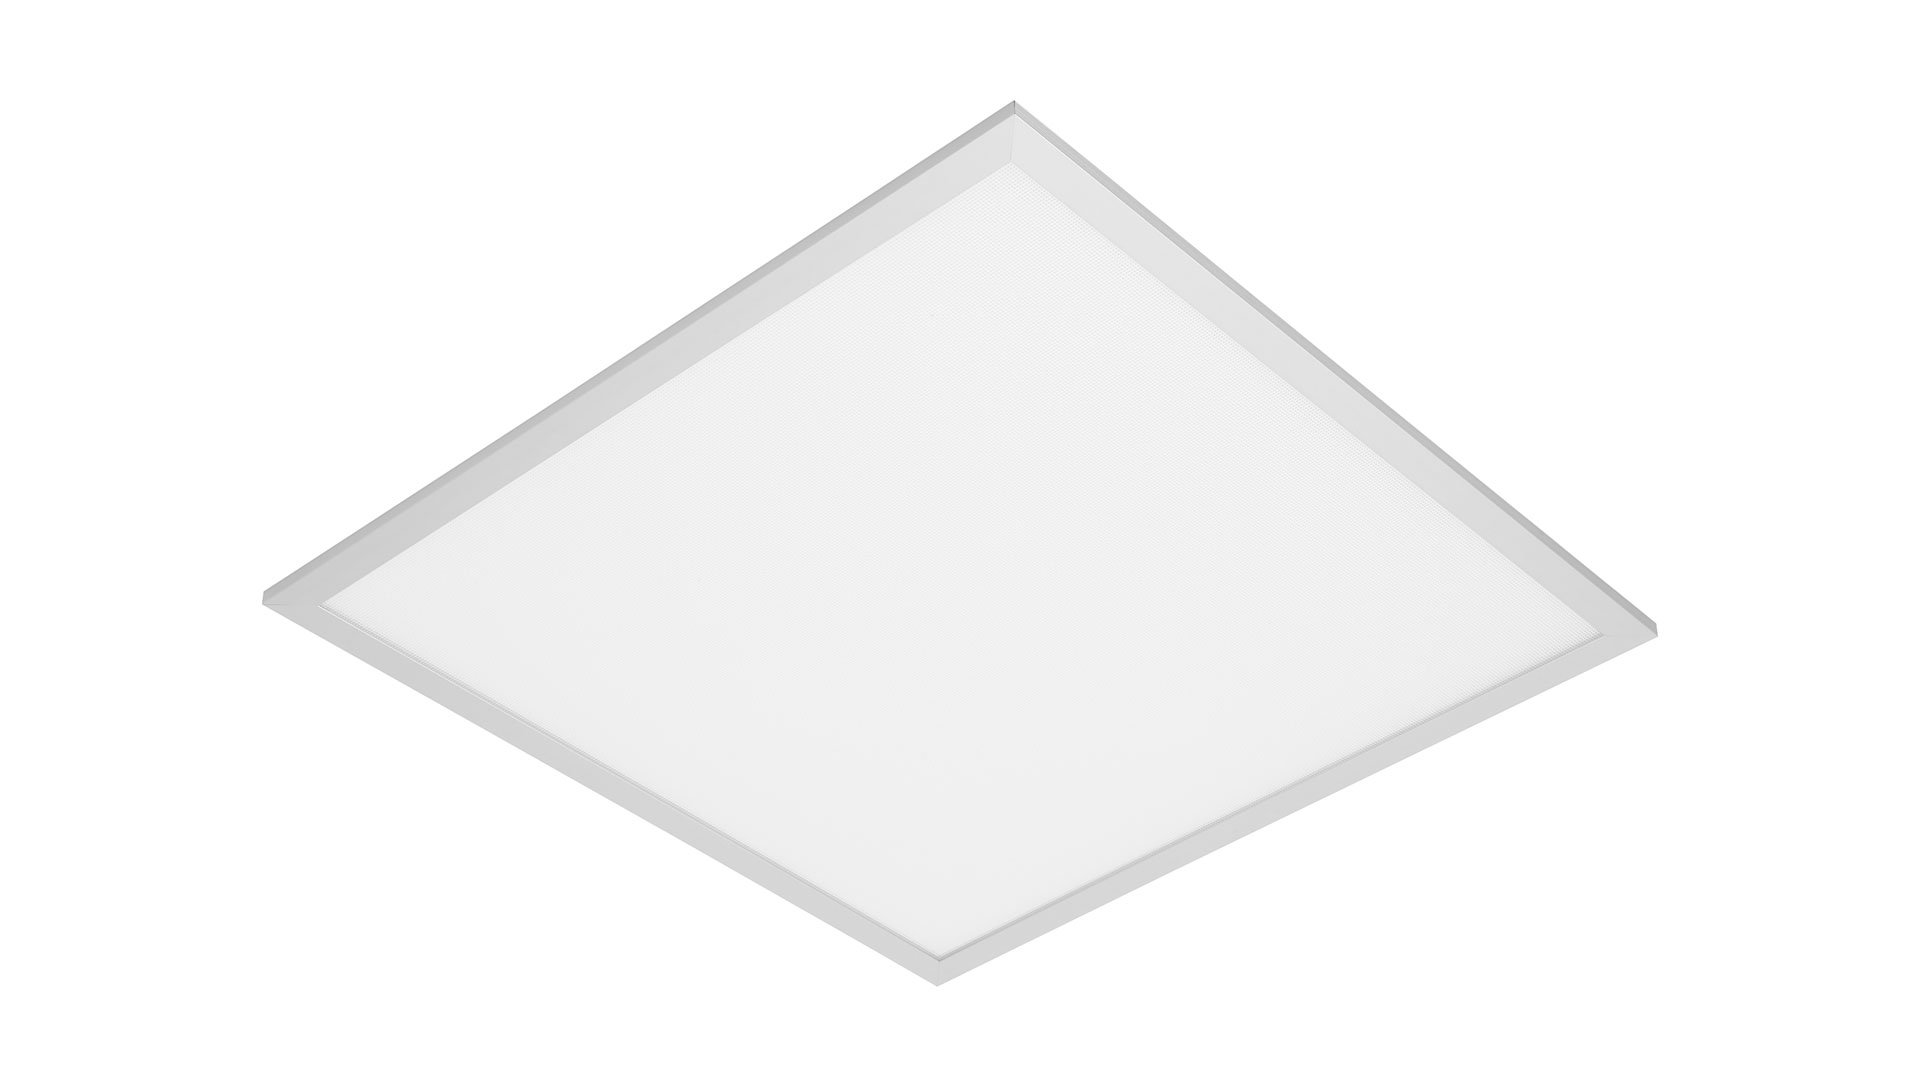 Lano PRO LED 43W,4100lm, 830, microprisma, EVG, M625, weiß